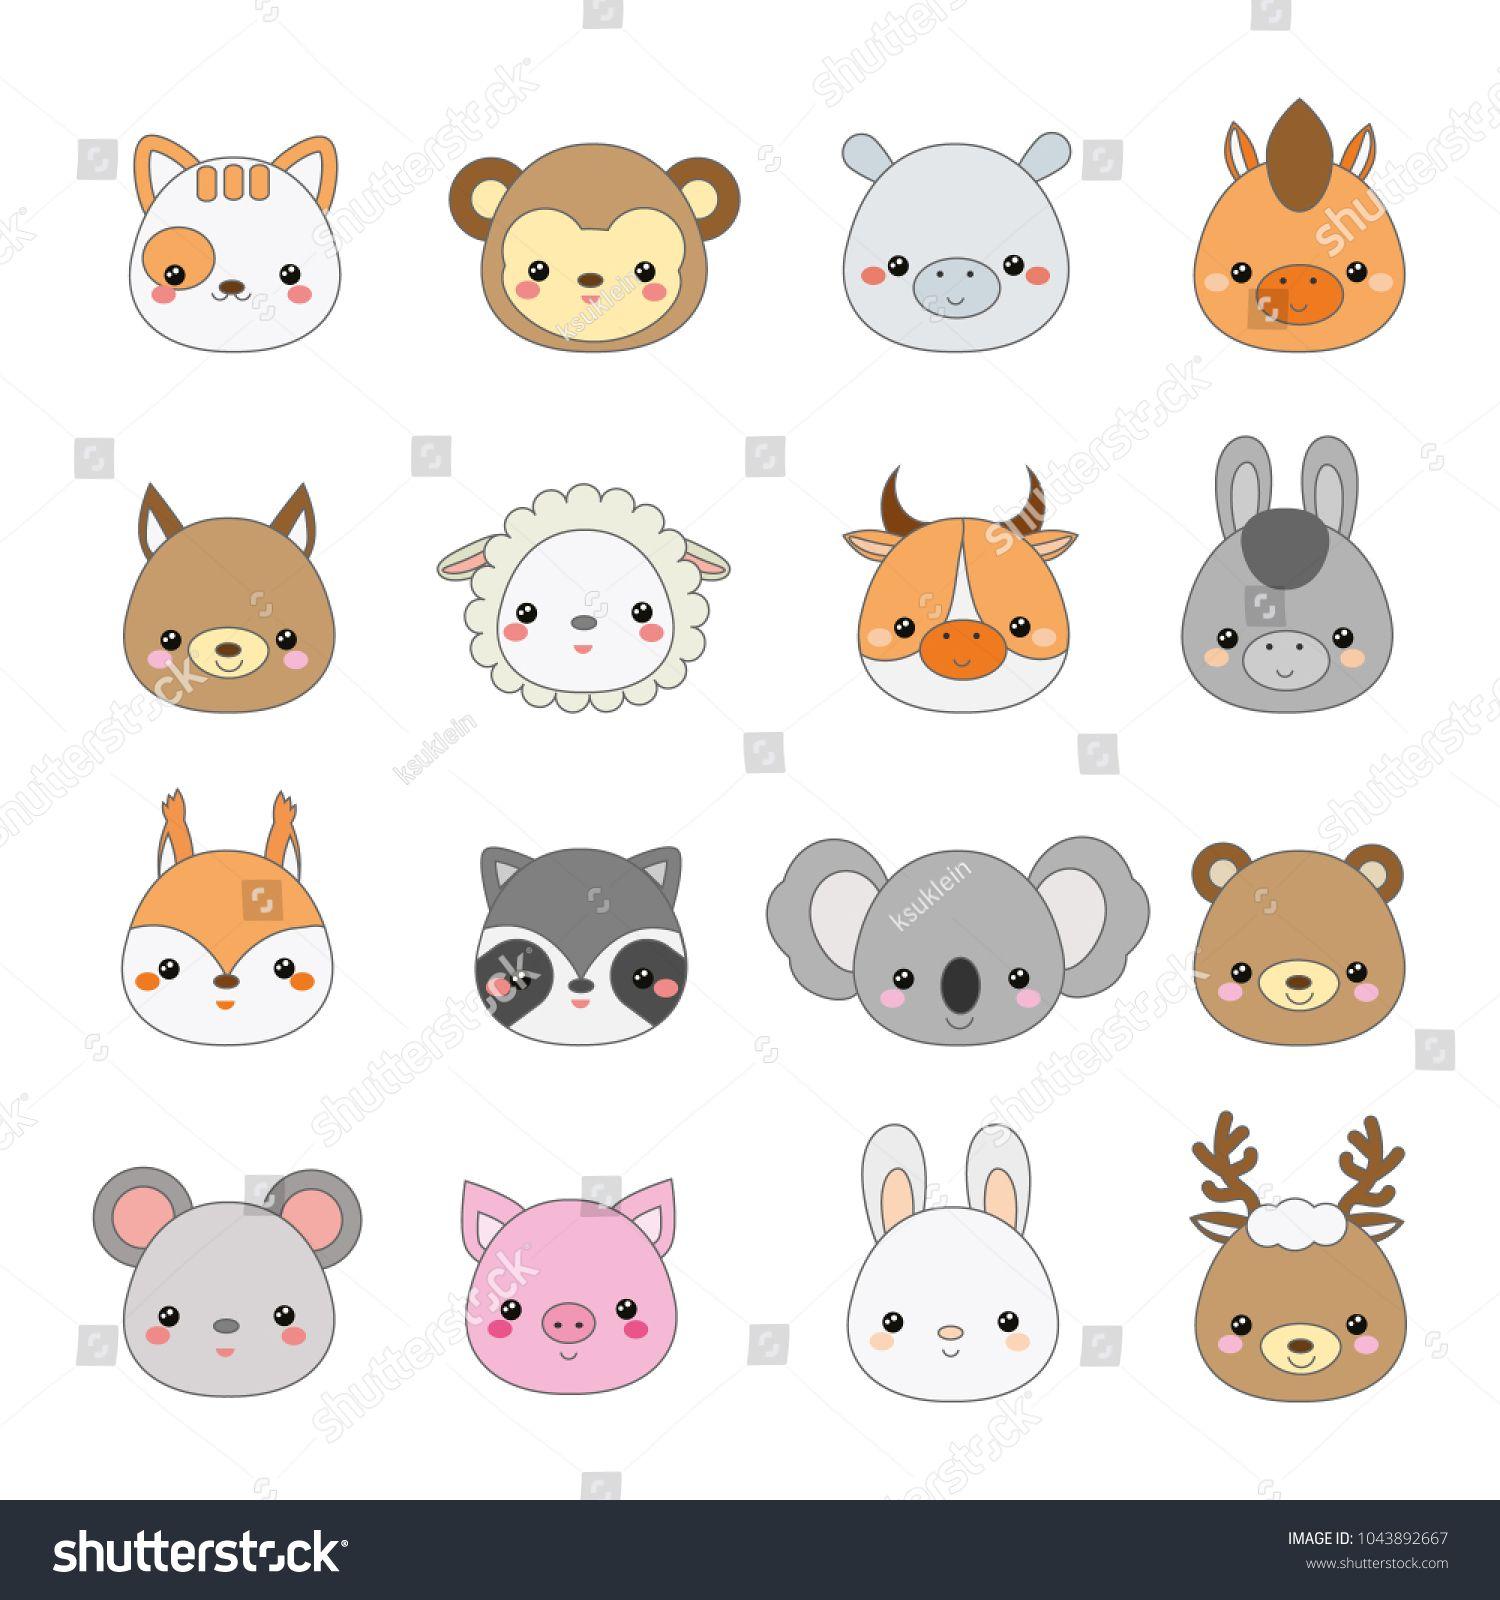 Cute Animals Faces Big Set Of Cartoon Kawaii Wildlife And Farm Animals Icons Stickers Emoji De Cute Animals With Funny Captions Animal Icon Cartoon Animals